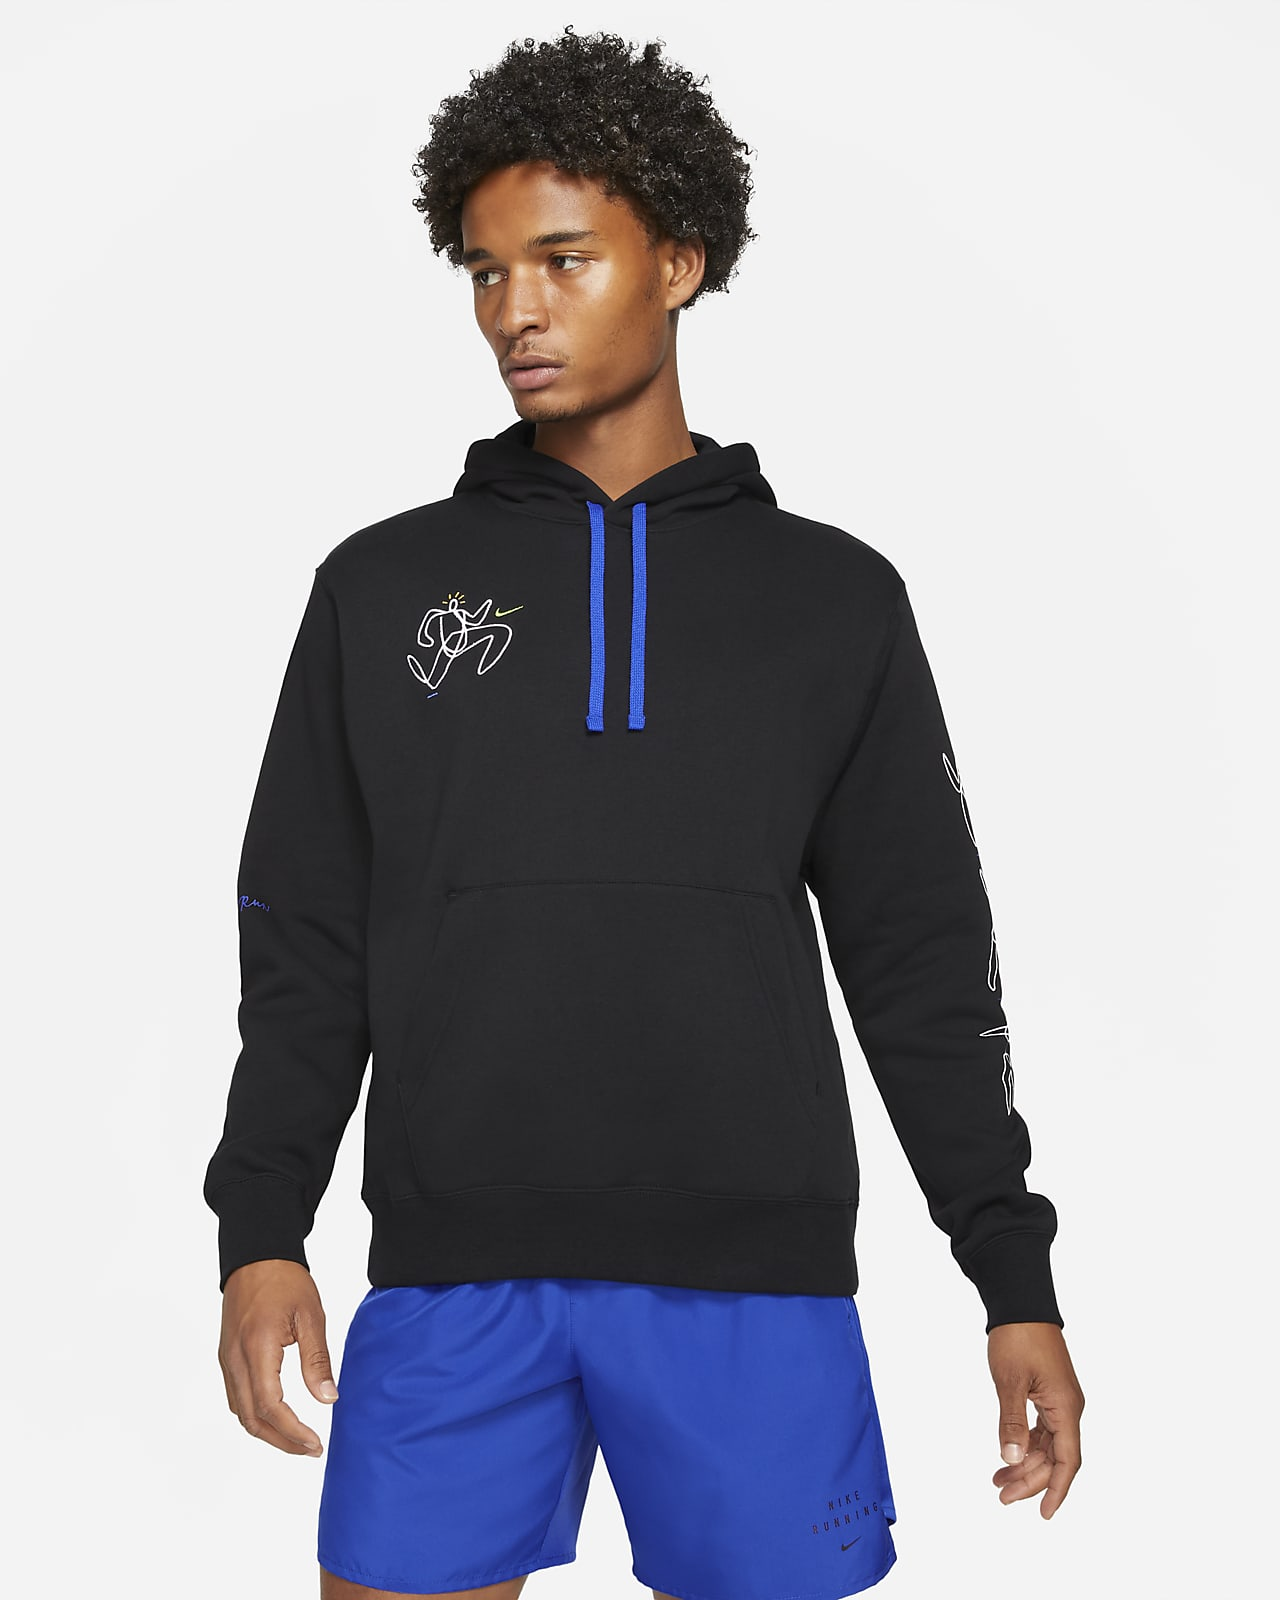 Sweat à capuche de running en tissu Fleece Nike Hackney Club pour Homme